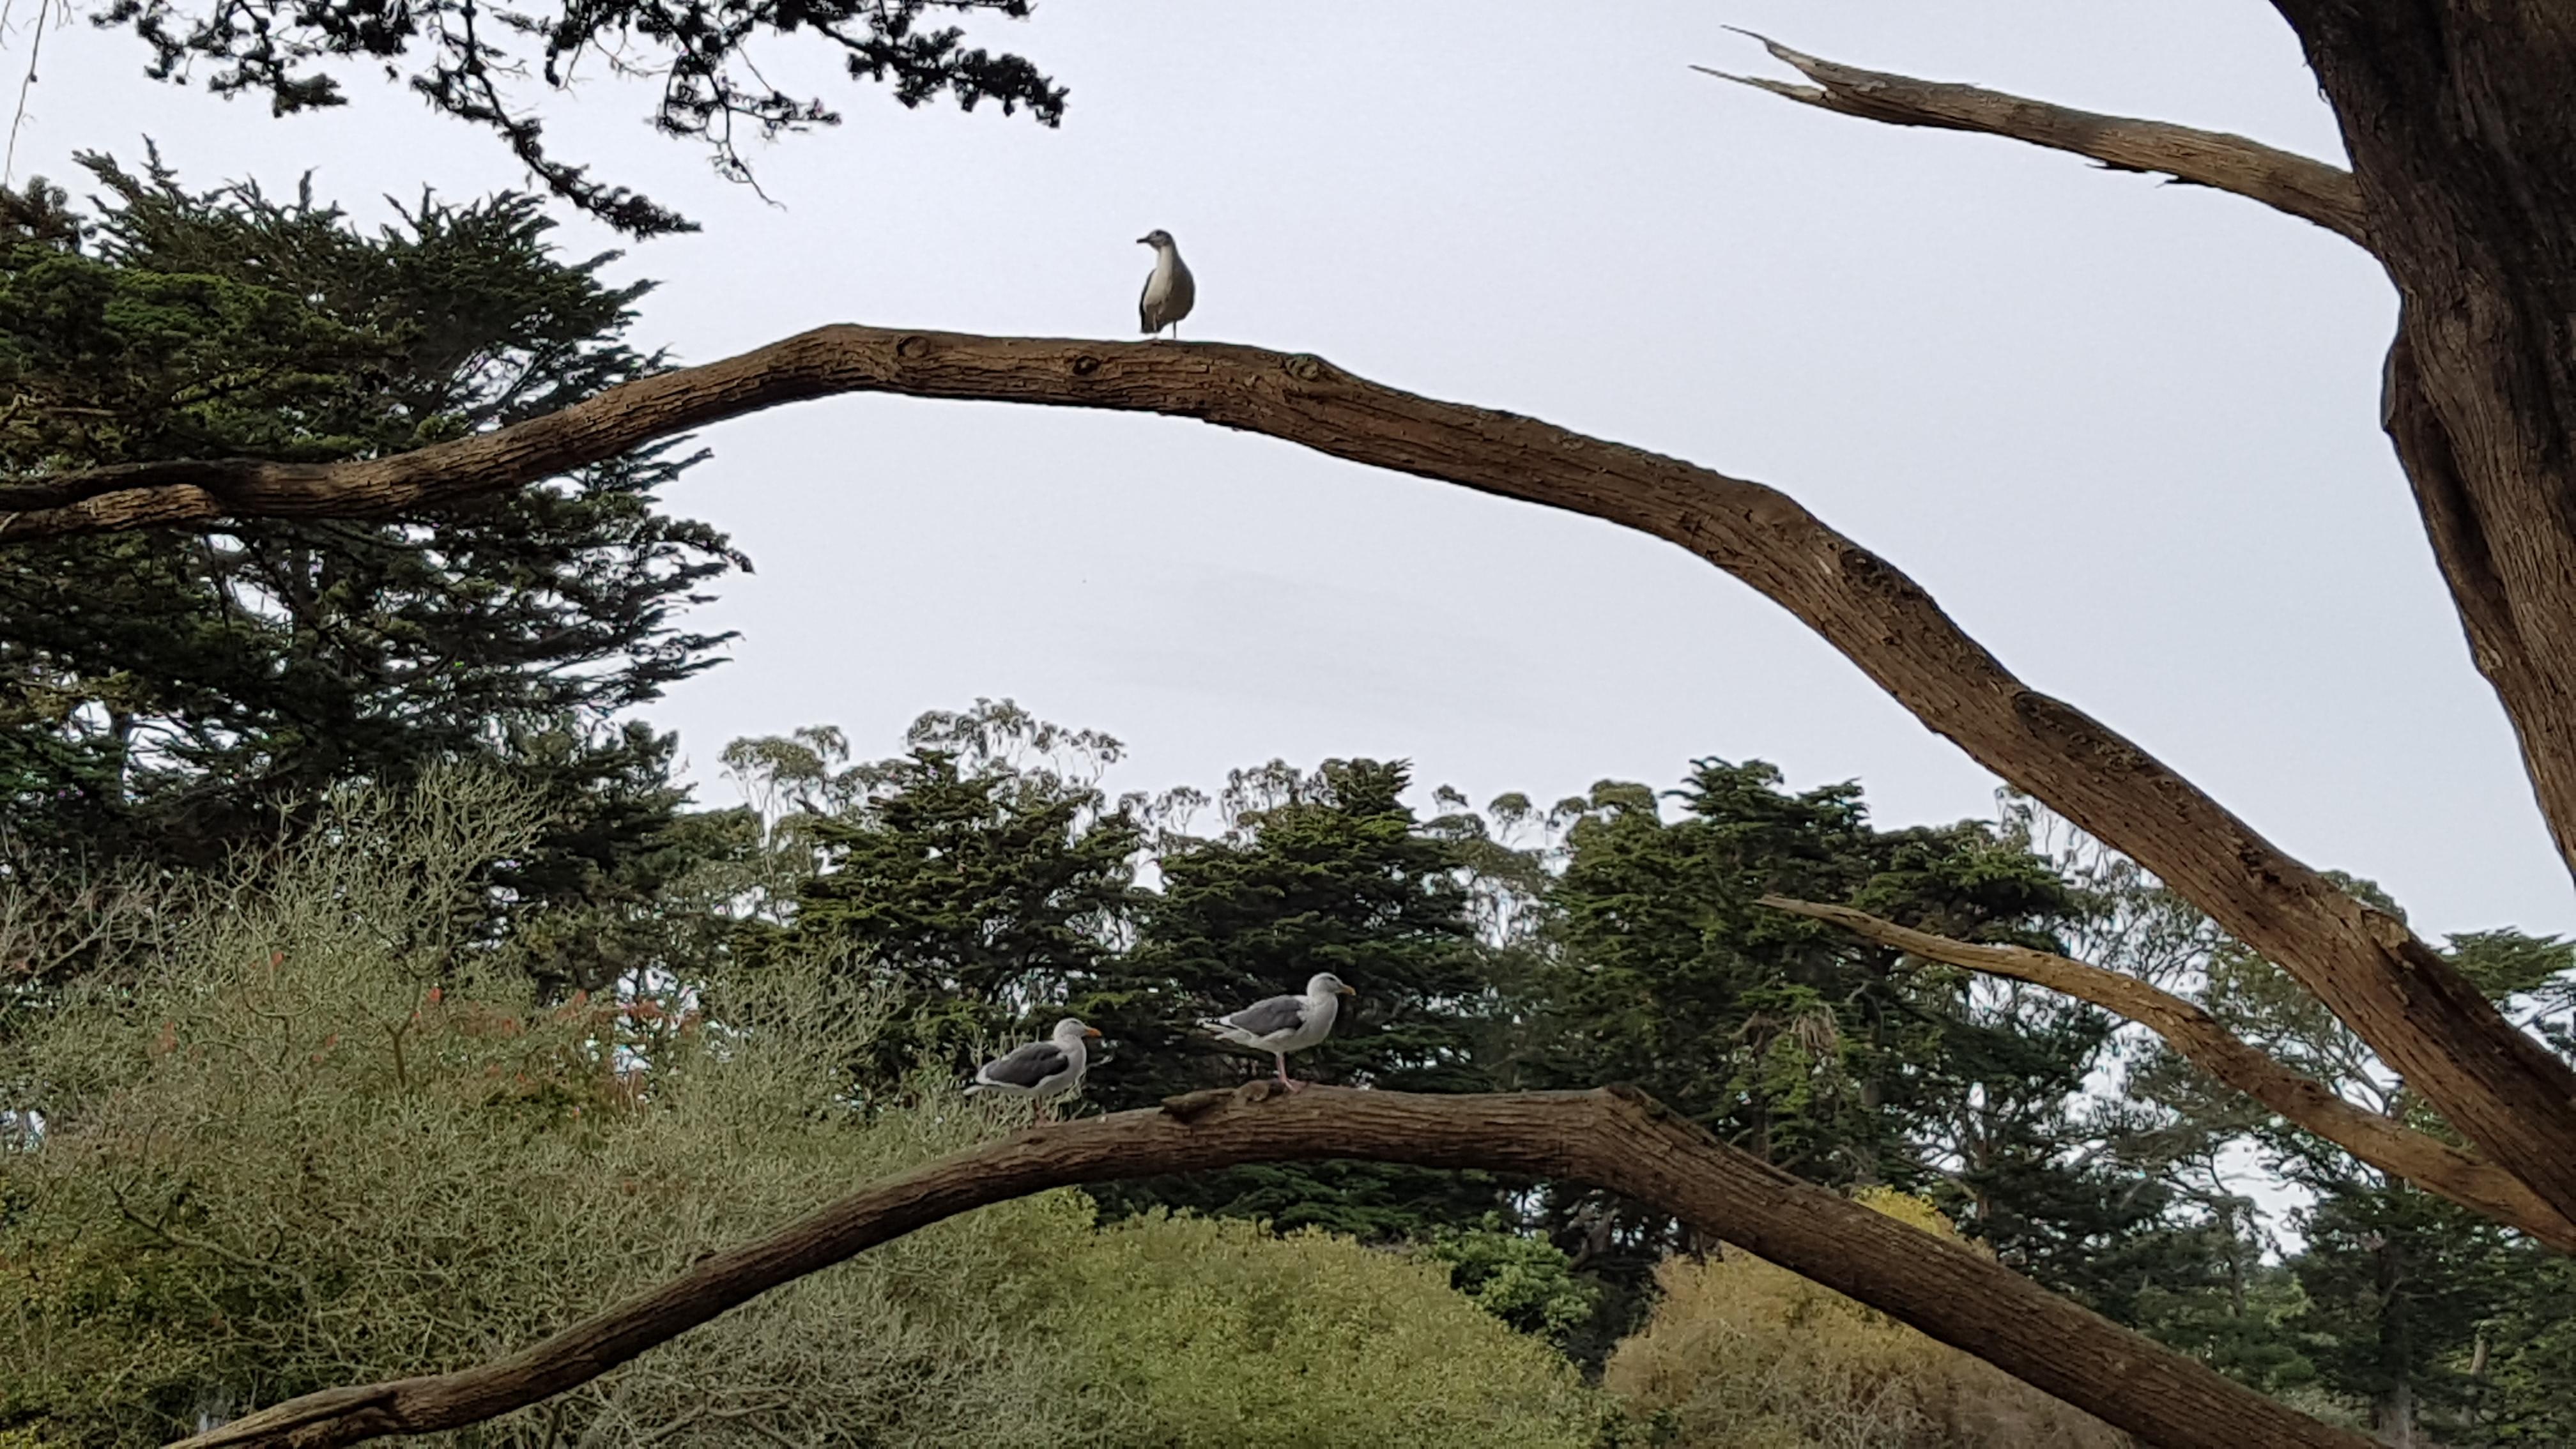 Golden Gate Park, ocean beach, Parrot 아줌마, [샌프란시스코] Golden Gate Park #2, 골든 게이트 파크, 괴기스러운 나무, 귀신 나무, 날것의 느낌, 독서, 돌다리, 돼지왕왕돼지, 멋순이, 멋쟁이, 멍 때리기, 무료, 무료 공원, 물 색, 바다, 벌 서는 오토바이, 벌 서며 타는 오토바이, 벌 서며 타는 자전거, 보트 대여, 보트 렌탈, 비둘기, 새, 새 떼, 새 먹이, 샌프란시스코, 숨은 그림 찾기, 아이패드 독서, 안내 지도, 앵무새, 앵무새 아줌마, 언덕, 연인, 엽서 사진, 영화의 한 장면, 오션 비치, 오솔길, 유랑, 입장료, 지도, 천둥오리, 초록색, 칠면조, 특이한 모양, 패달 보트, 해리포터 동네, 호수